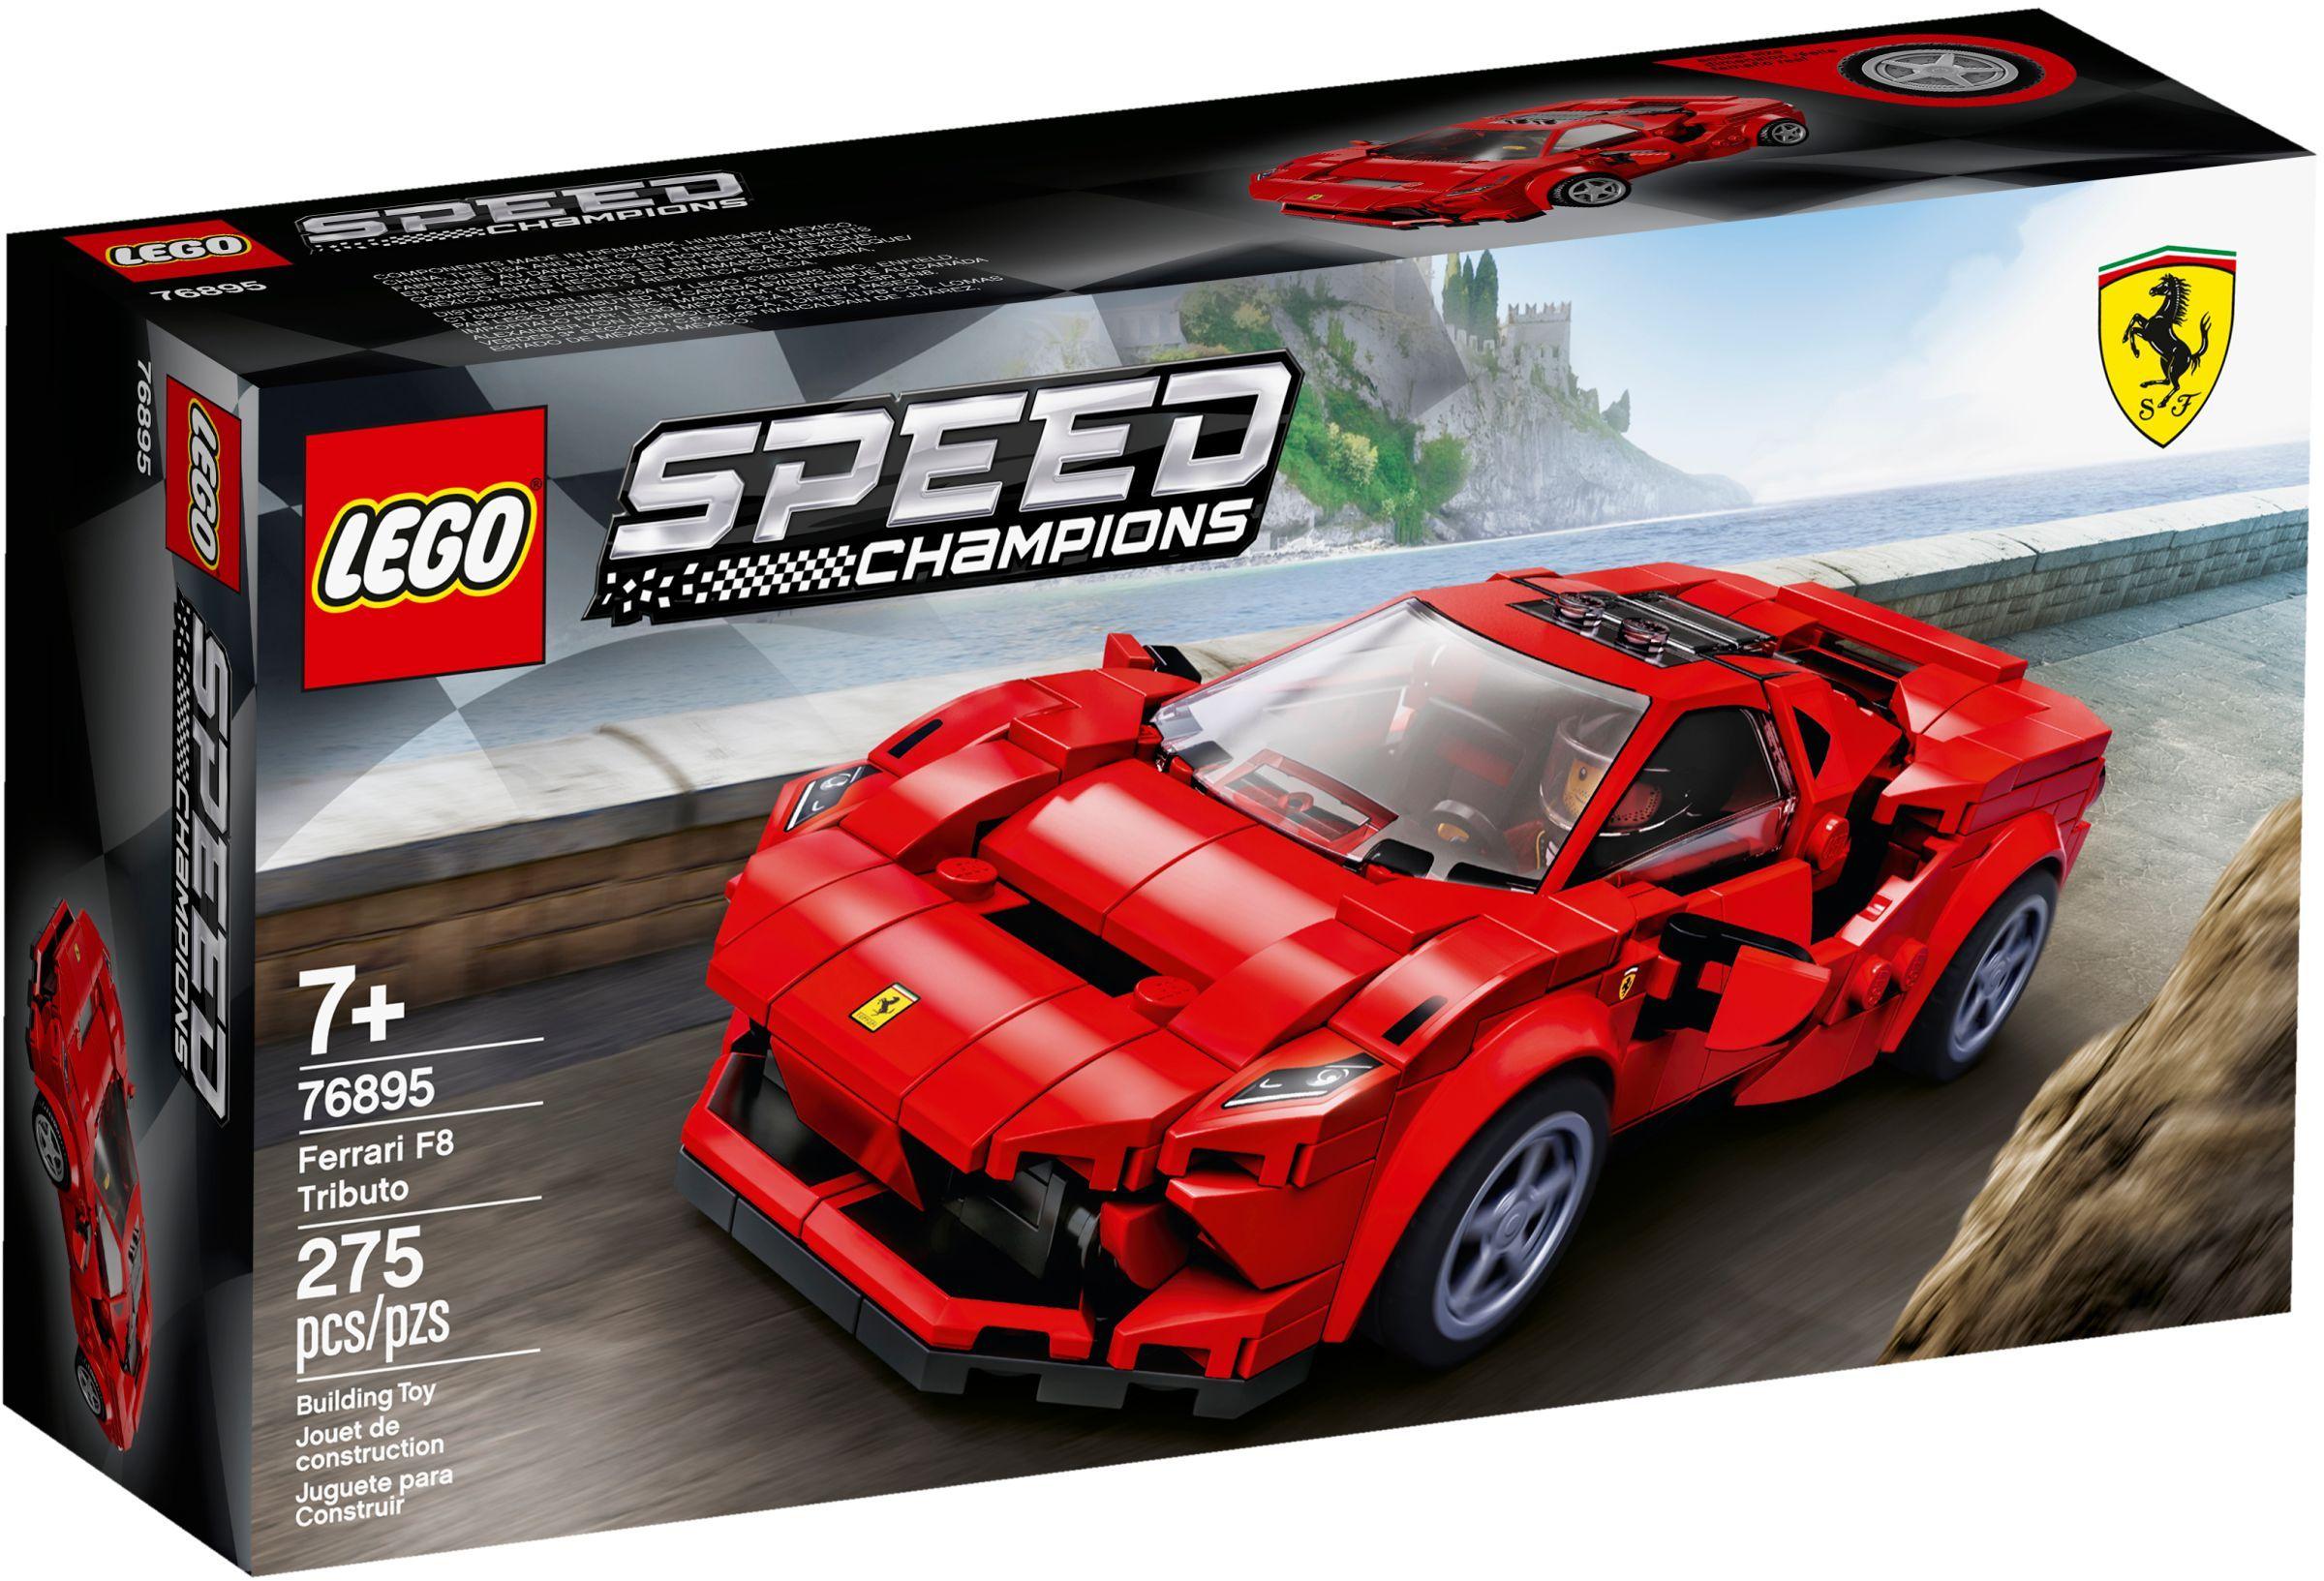 76895 LEGO Speed Champions Ferrari F8 Tributo - Xe mô hình Ferrari F8 Tributo